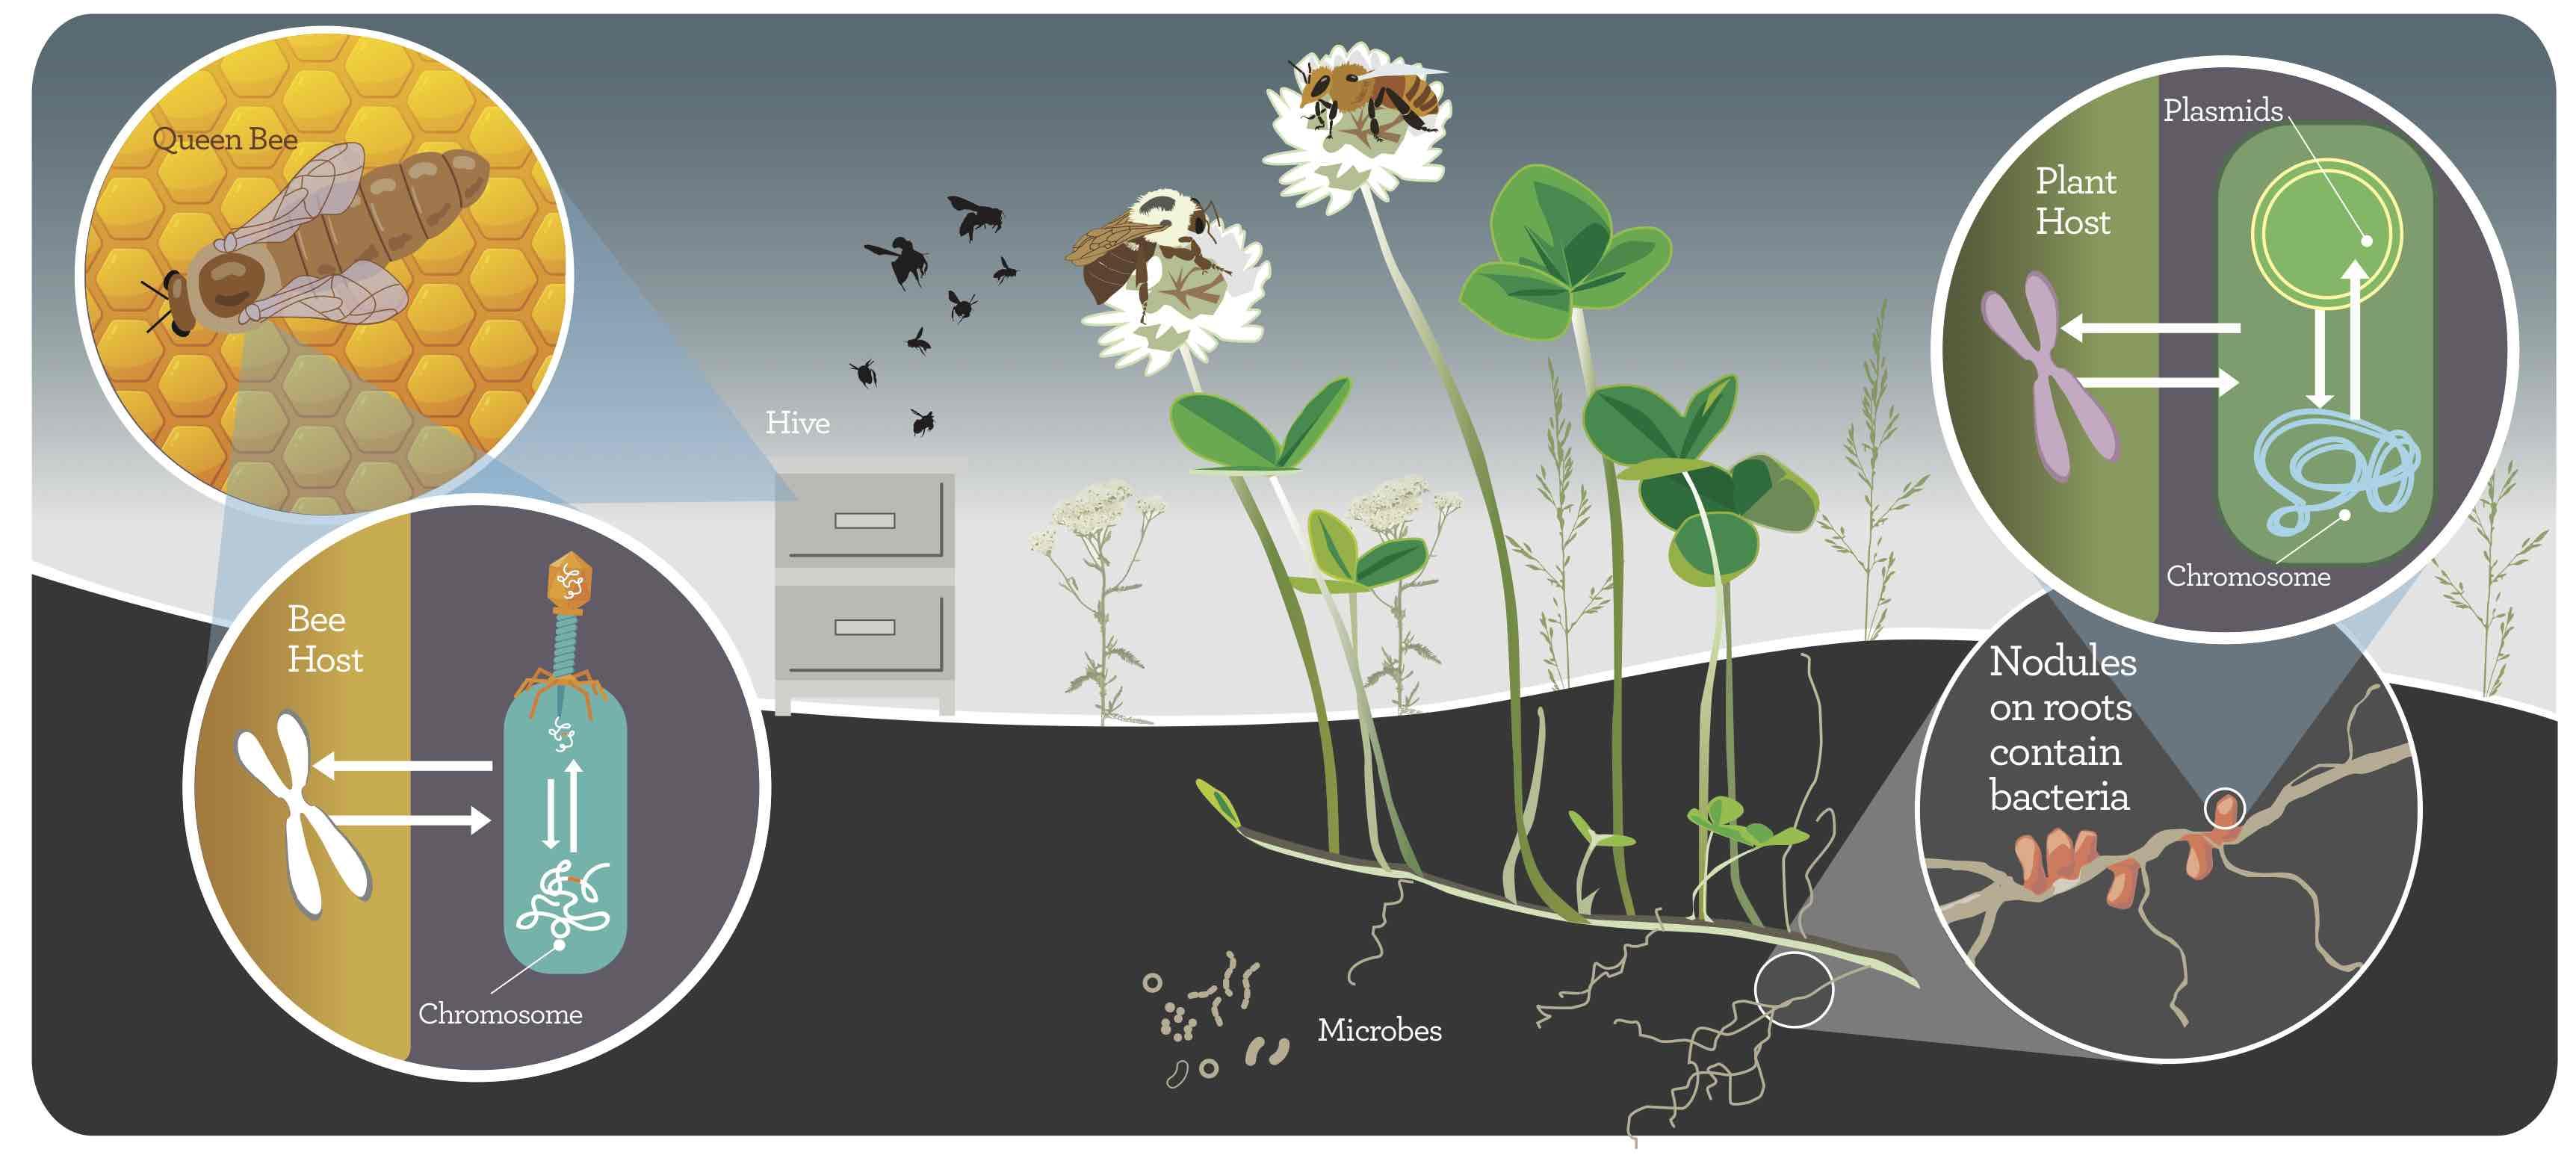 Symbiosis to reintegrate biology